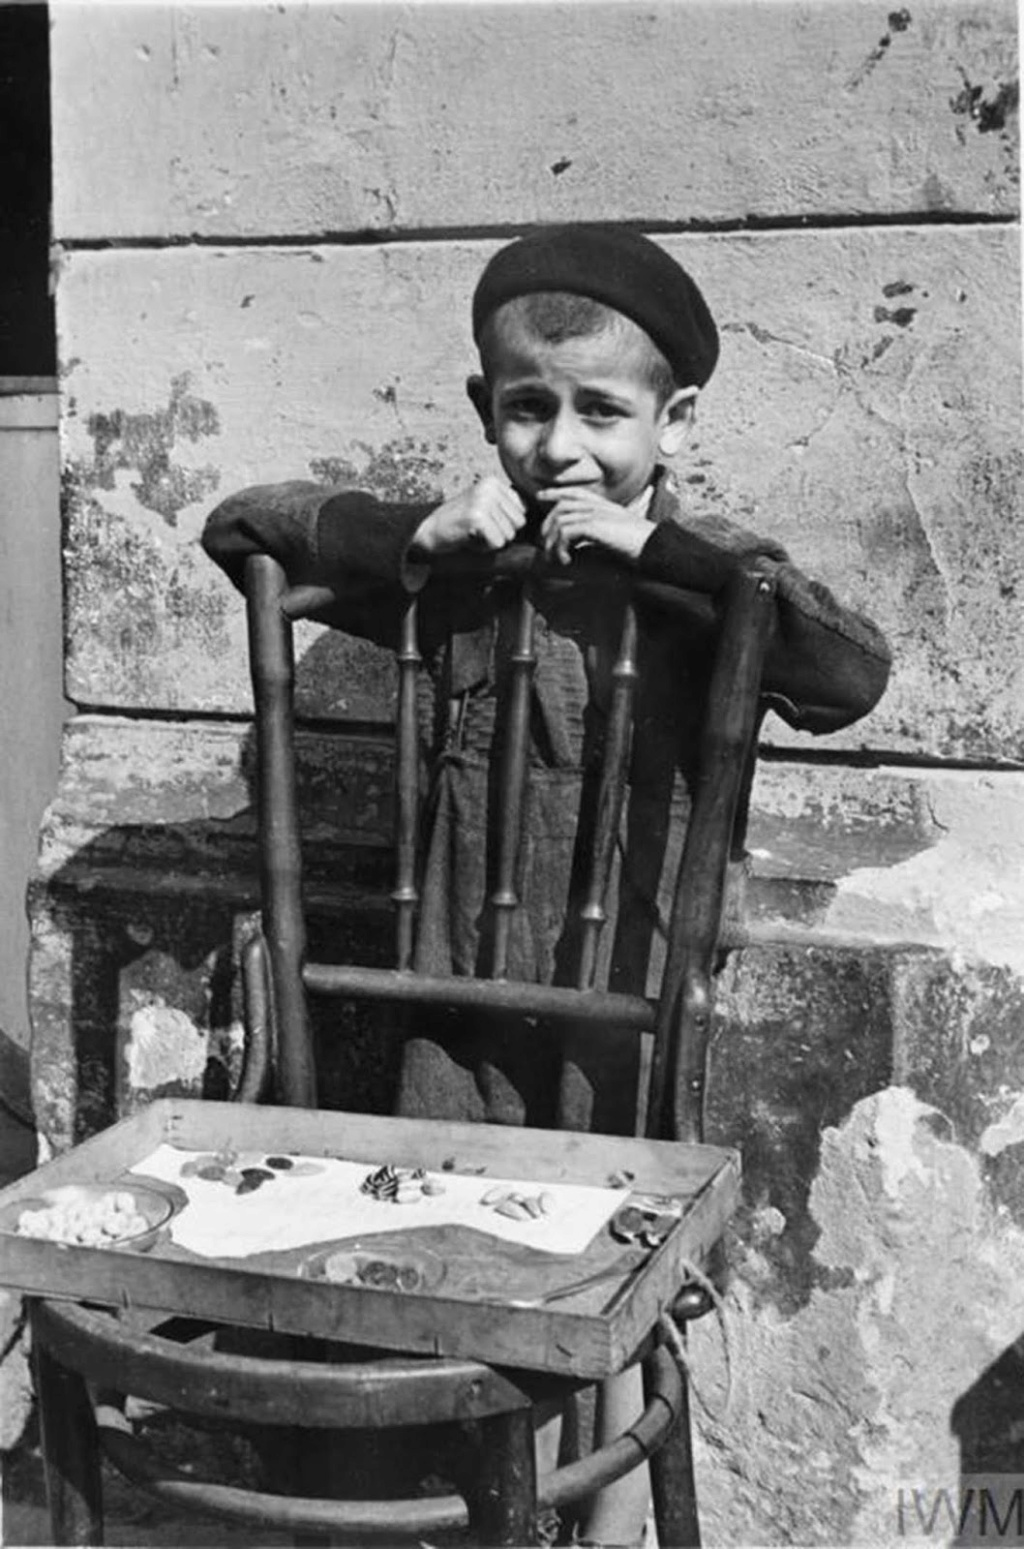 Diverses photos de la WWII - Page 40 94711